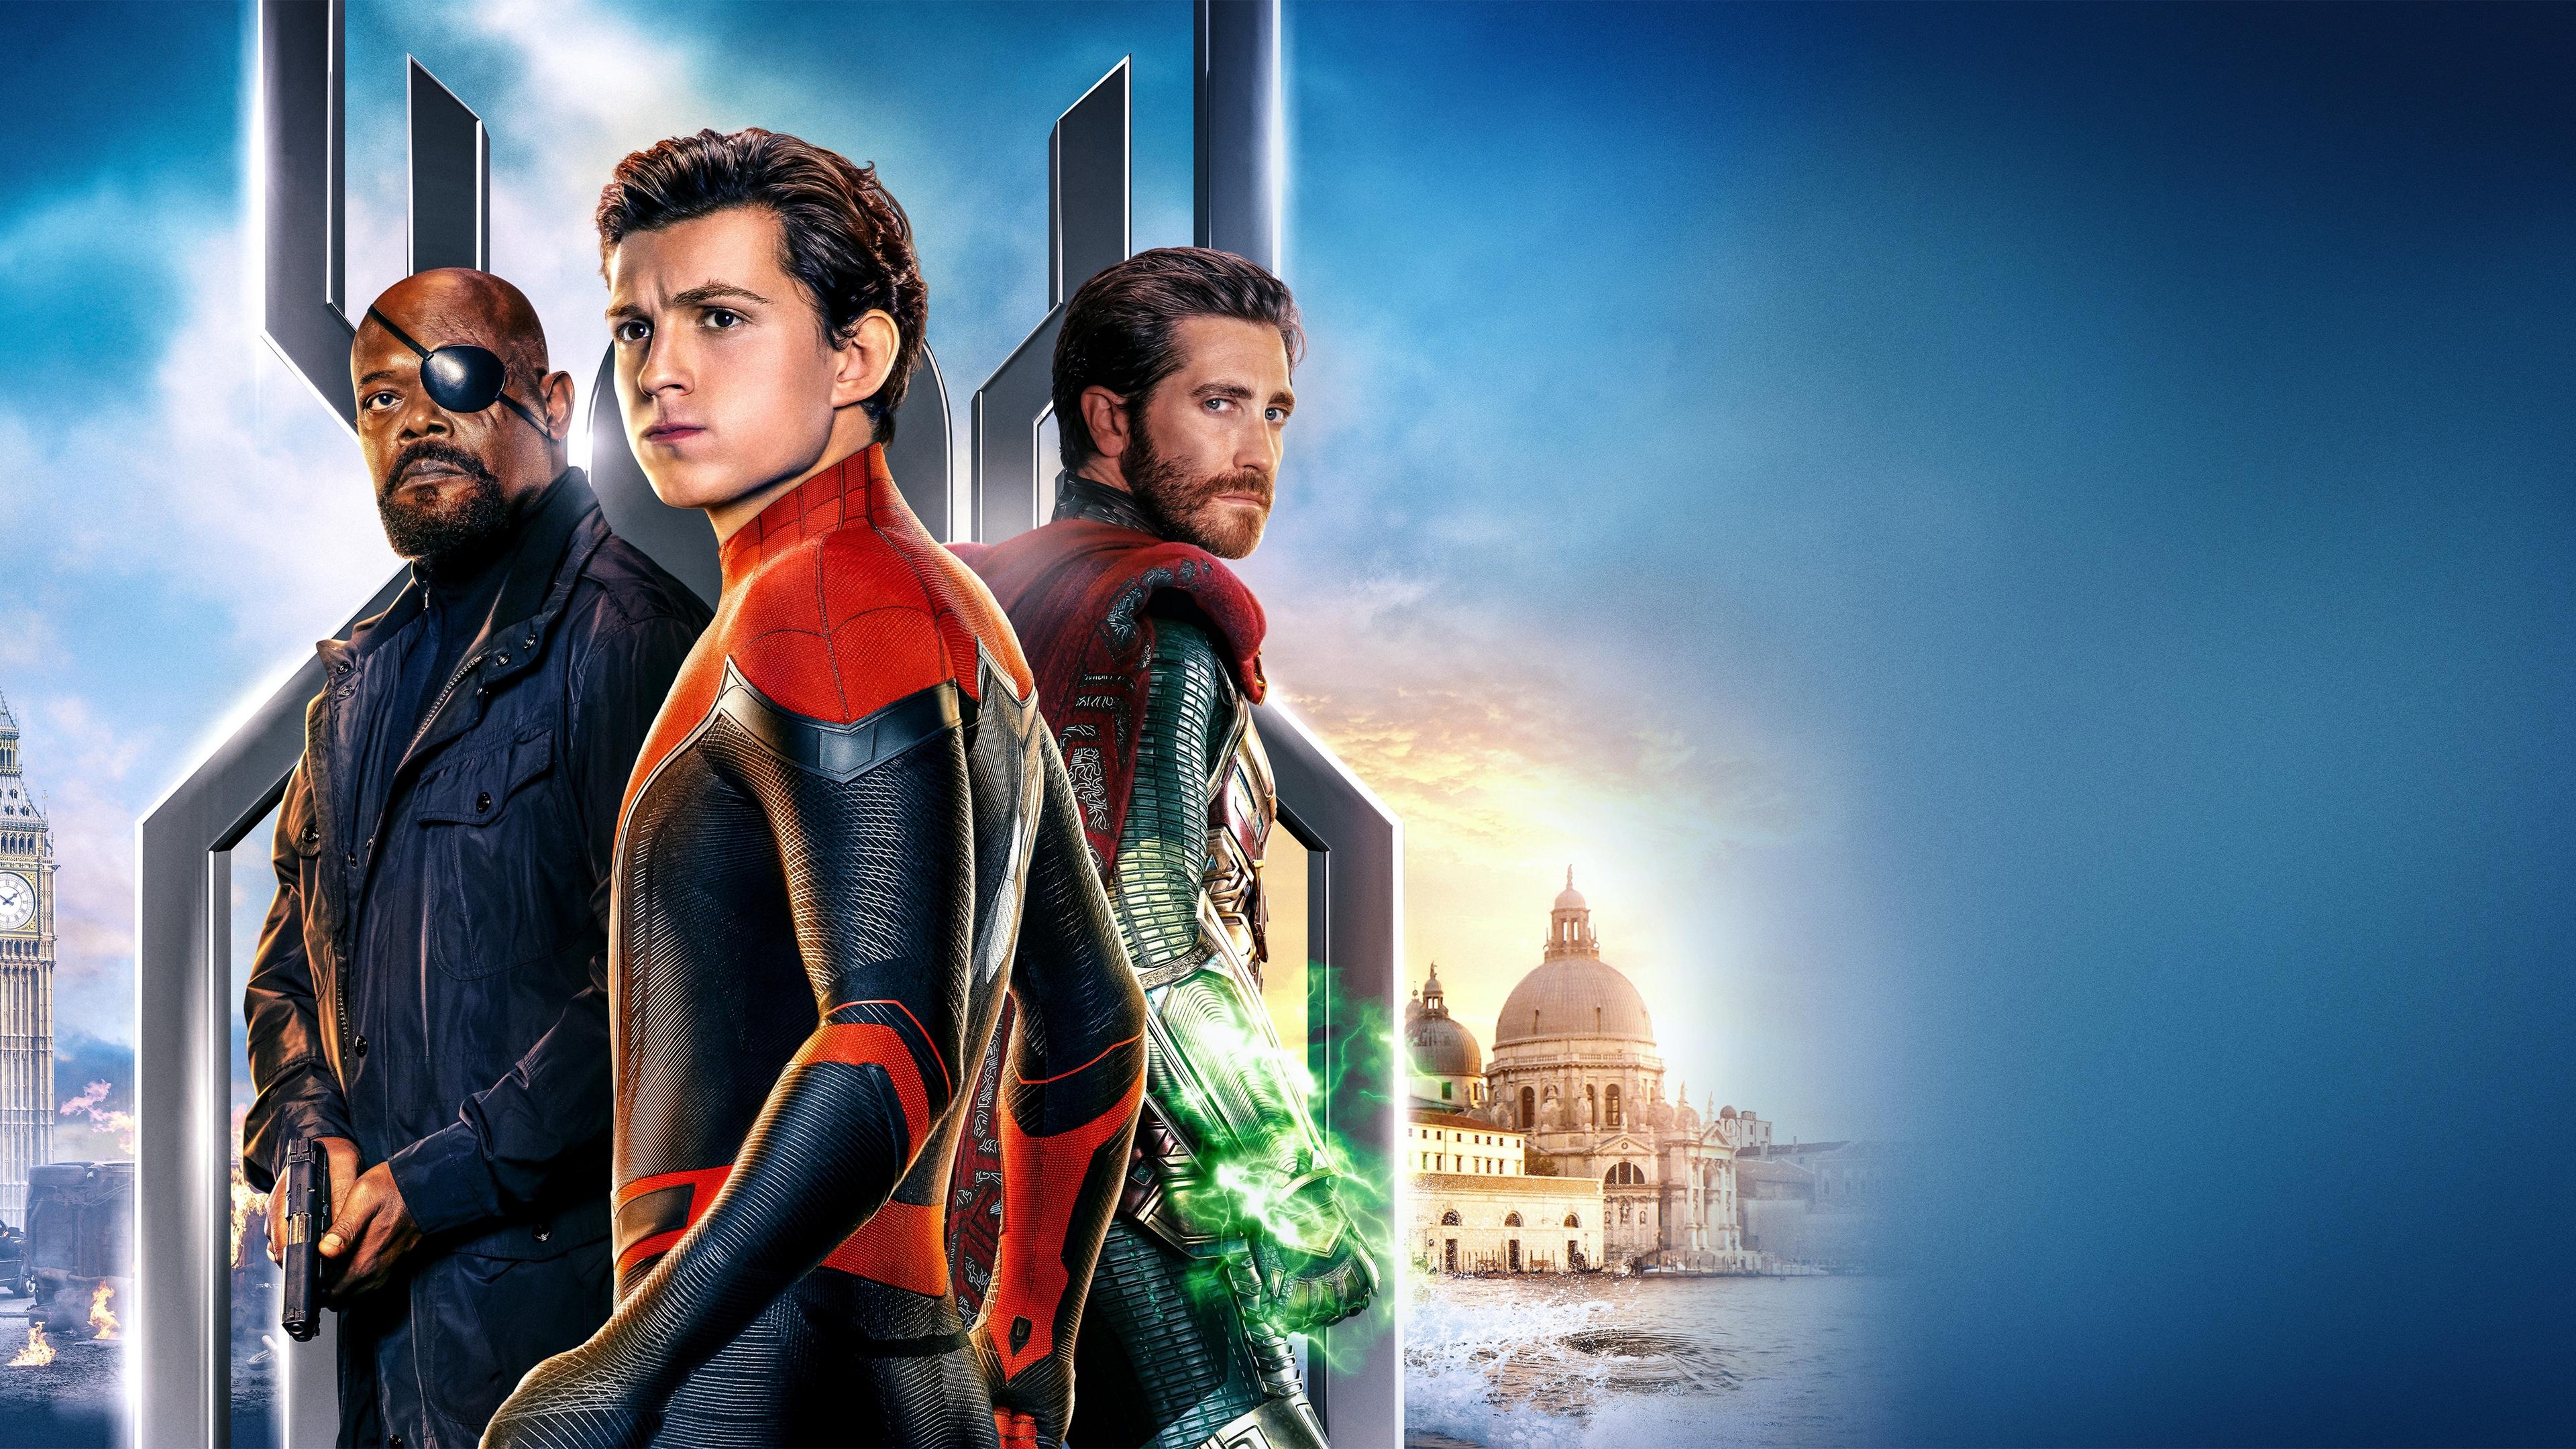 Wallpaper 4k 2019 Spiderman Far From Home Movie 4k 2019